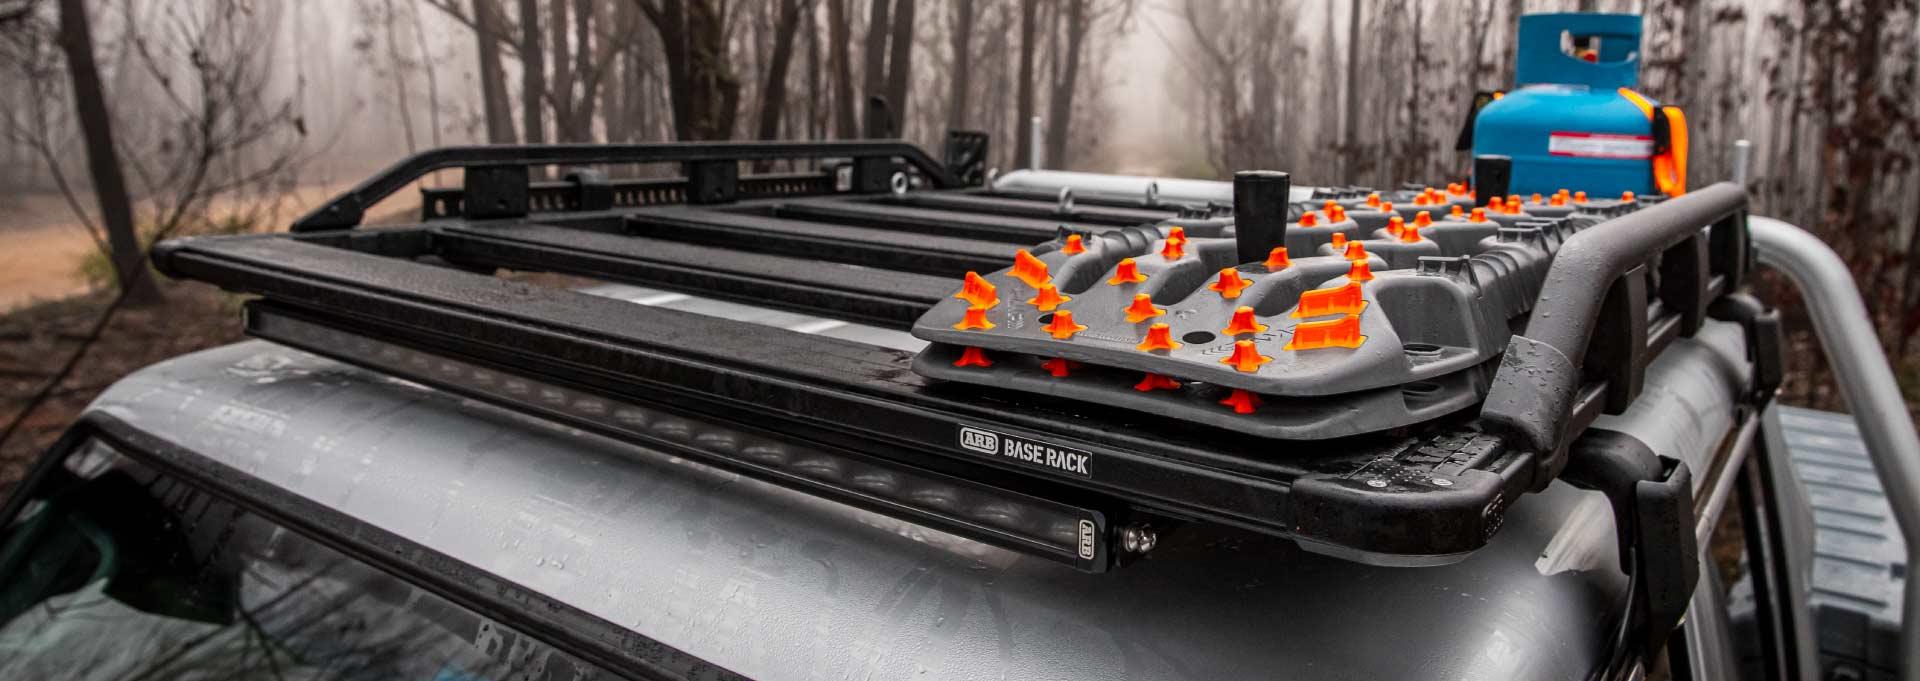 ARB BASE RACK ベースラック:薄型フラット ルーフラック ARB TRED PTO(トレッドプロ)サンドラダー 積載